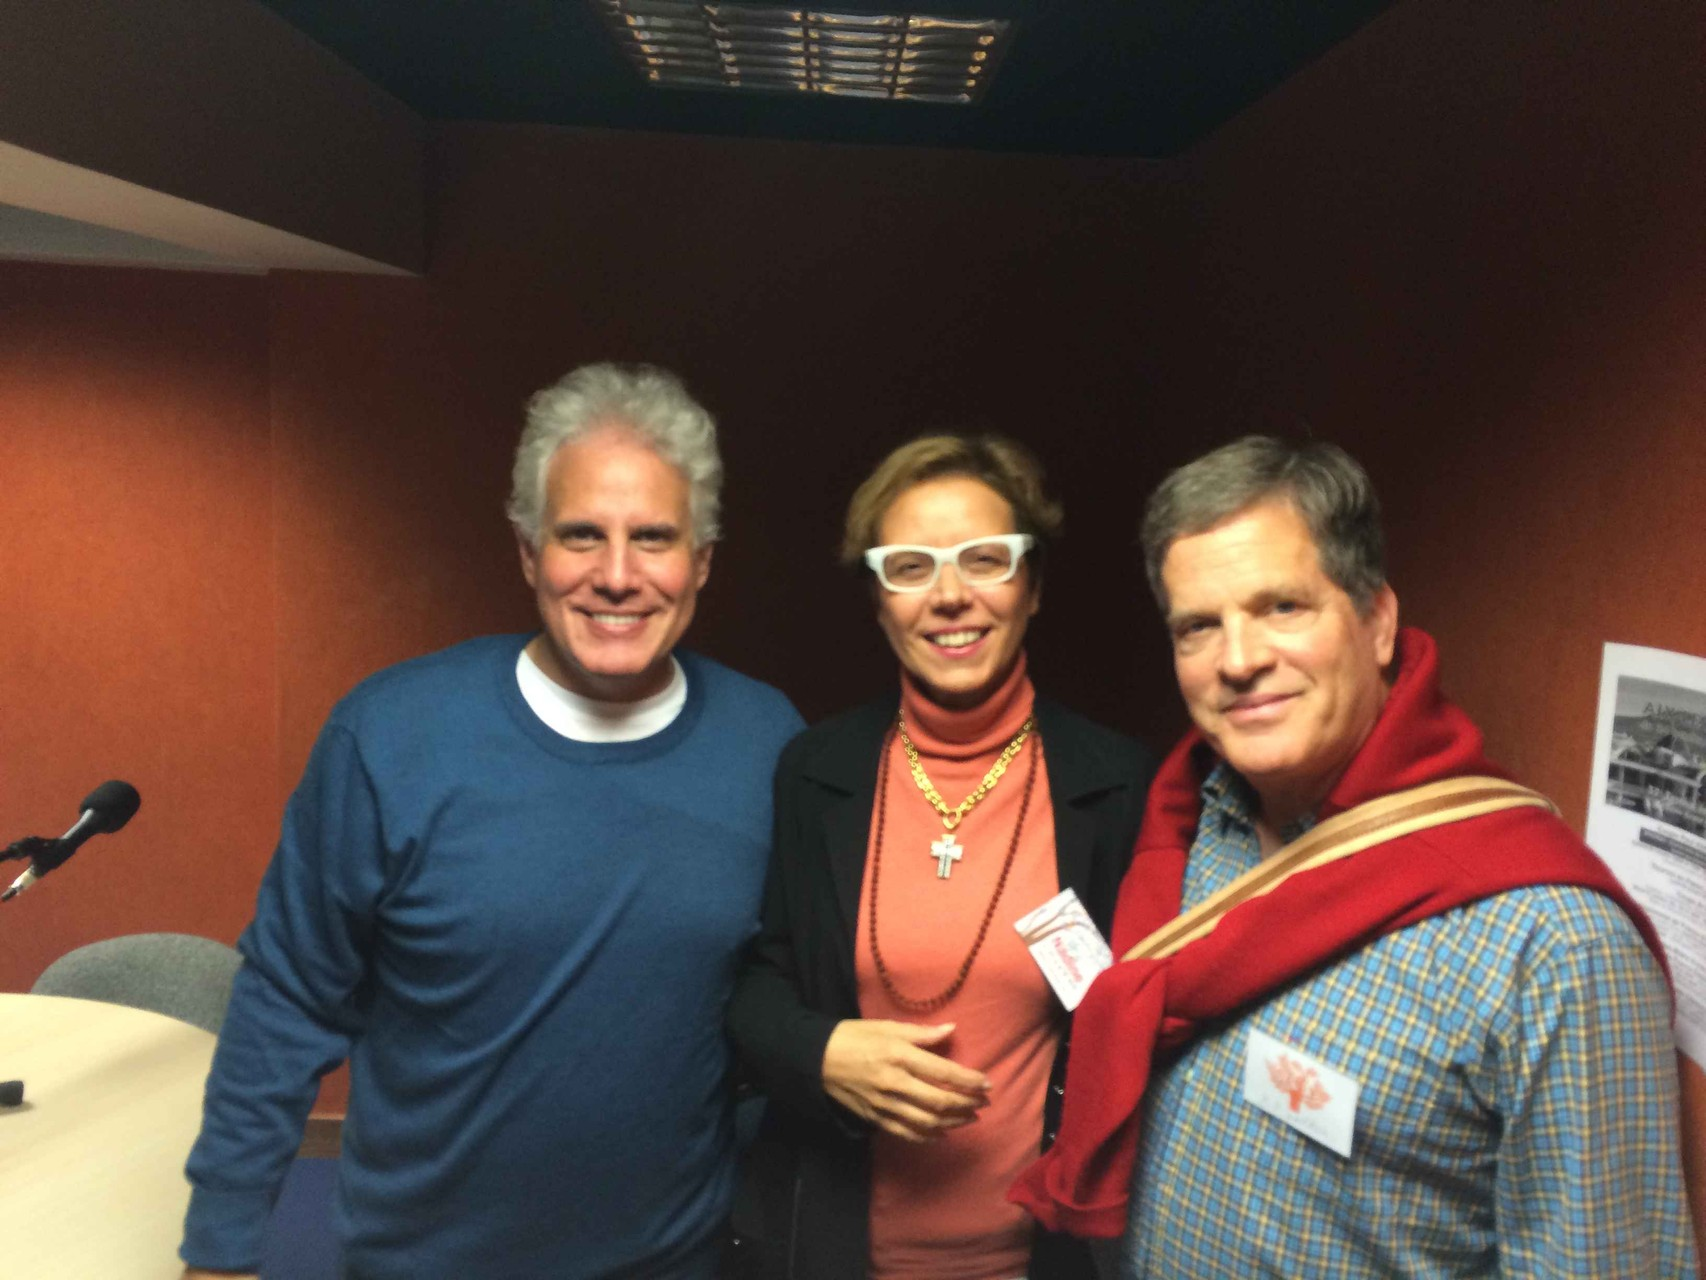 Shivani avec Steven Rudolph et Bill (traducteur)